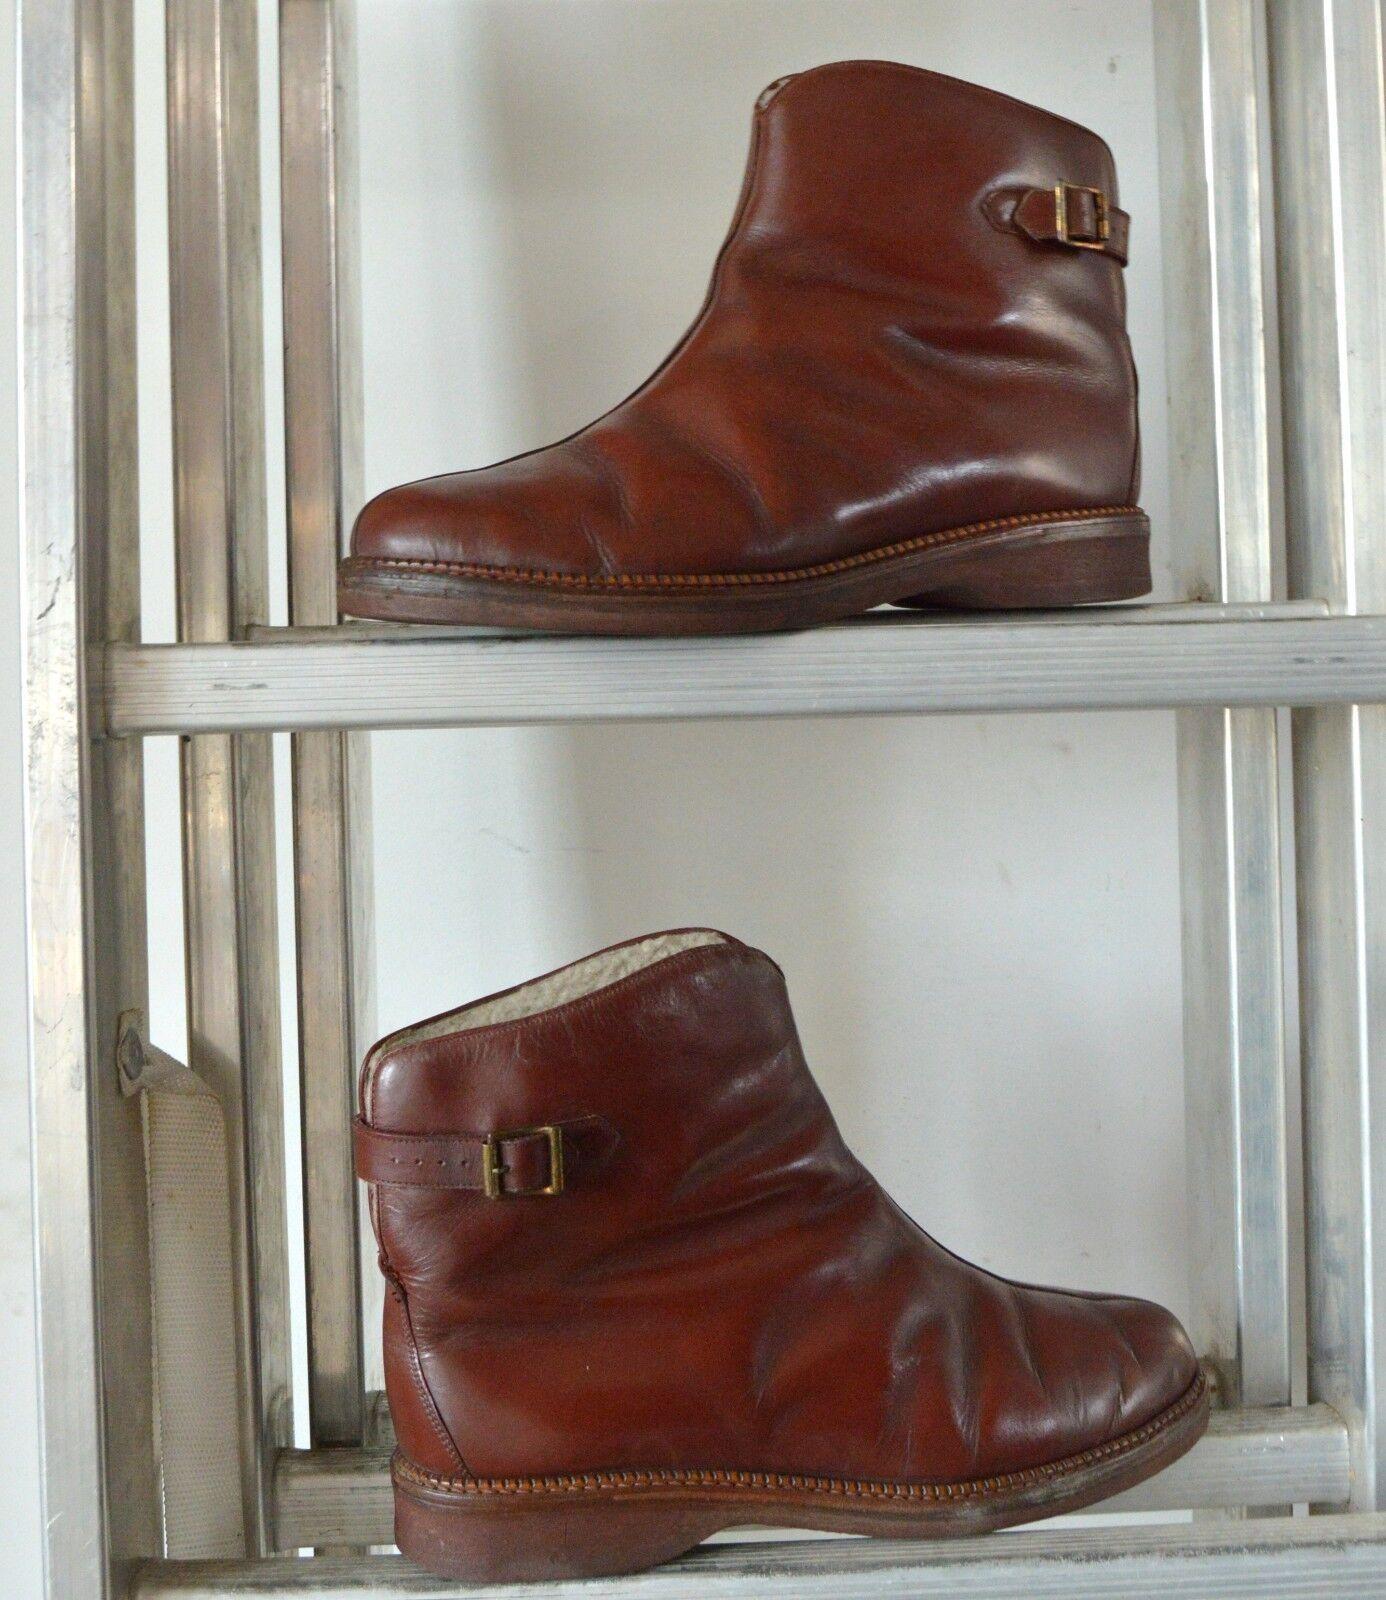 Antik botín Boots semi botas 40er True vintage botas look